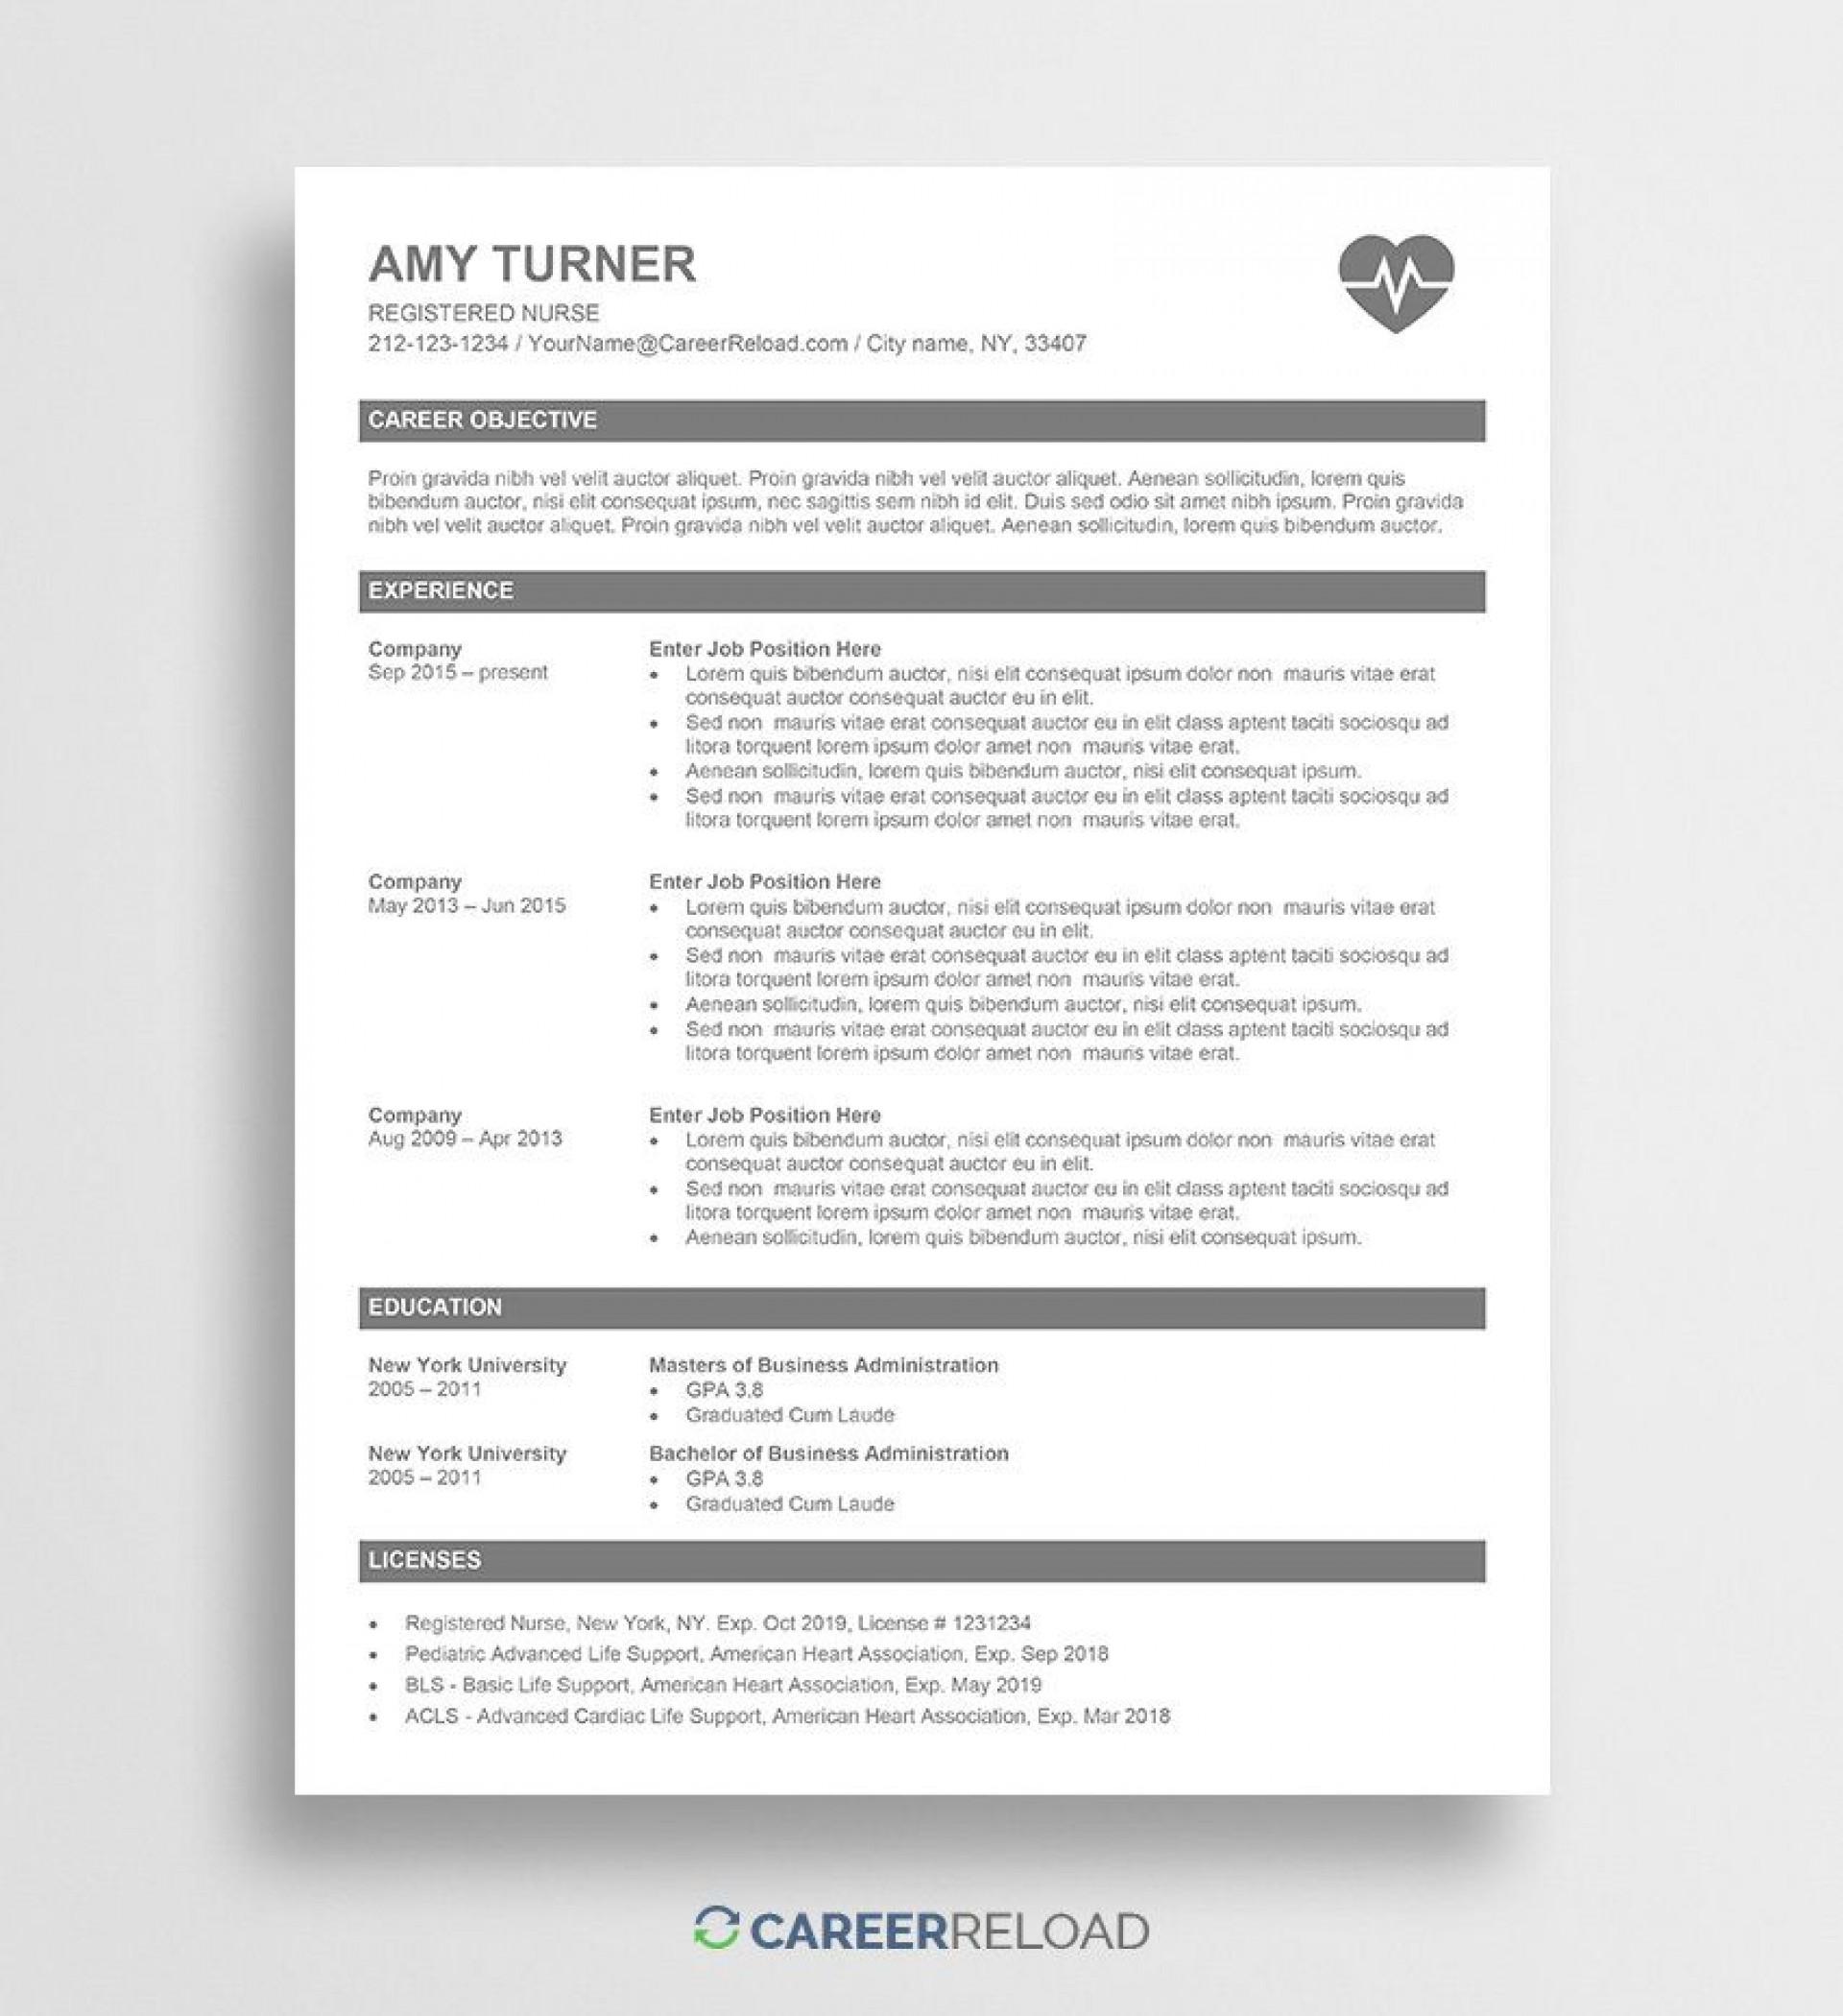 006 Shocking Nurse Resume Template Word Inspiration  Cv Free Download Rn1920